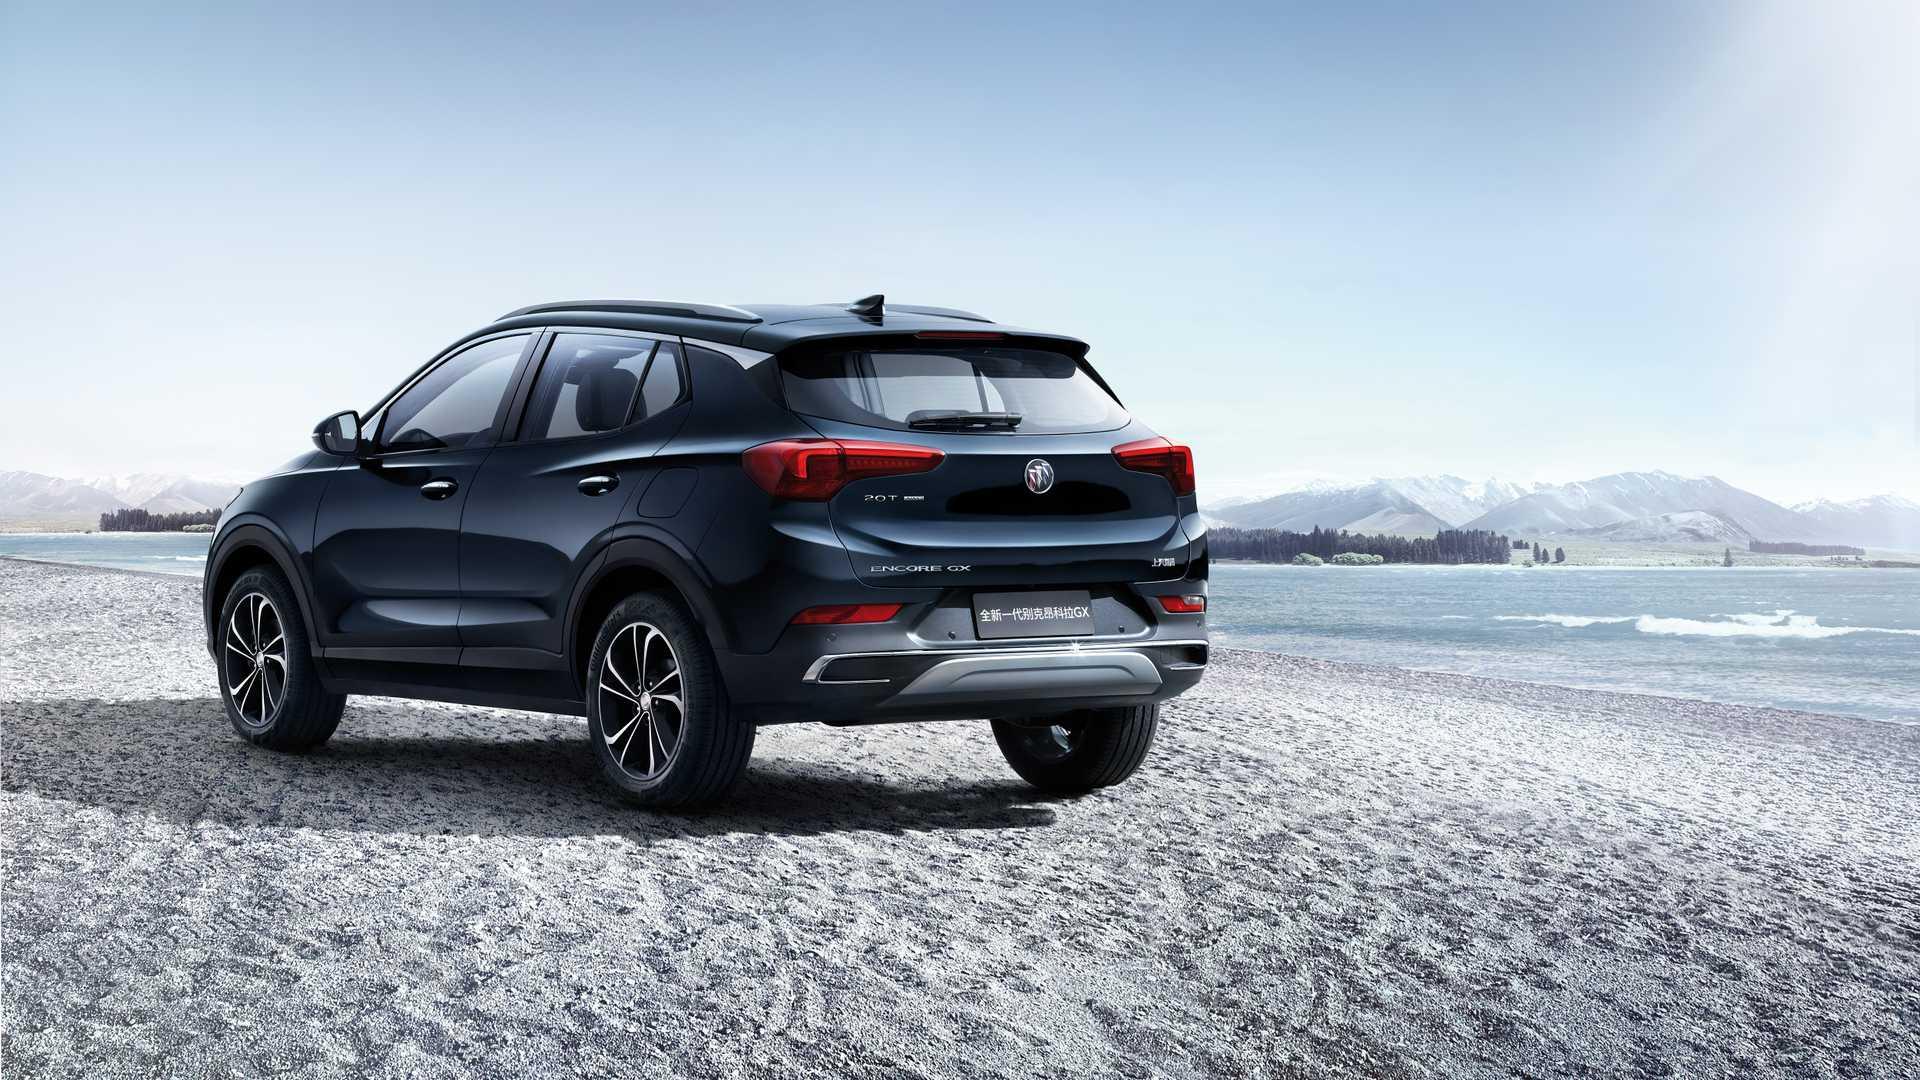 2020 Buick Encore Gx Revealed For The U S Market Autoevolution